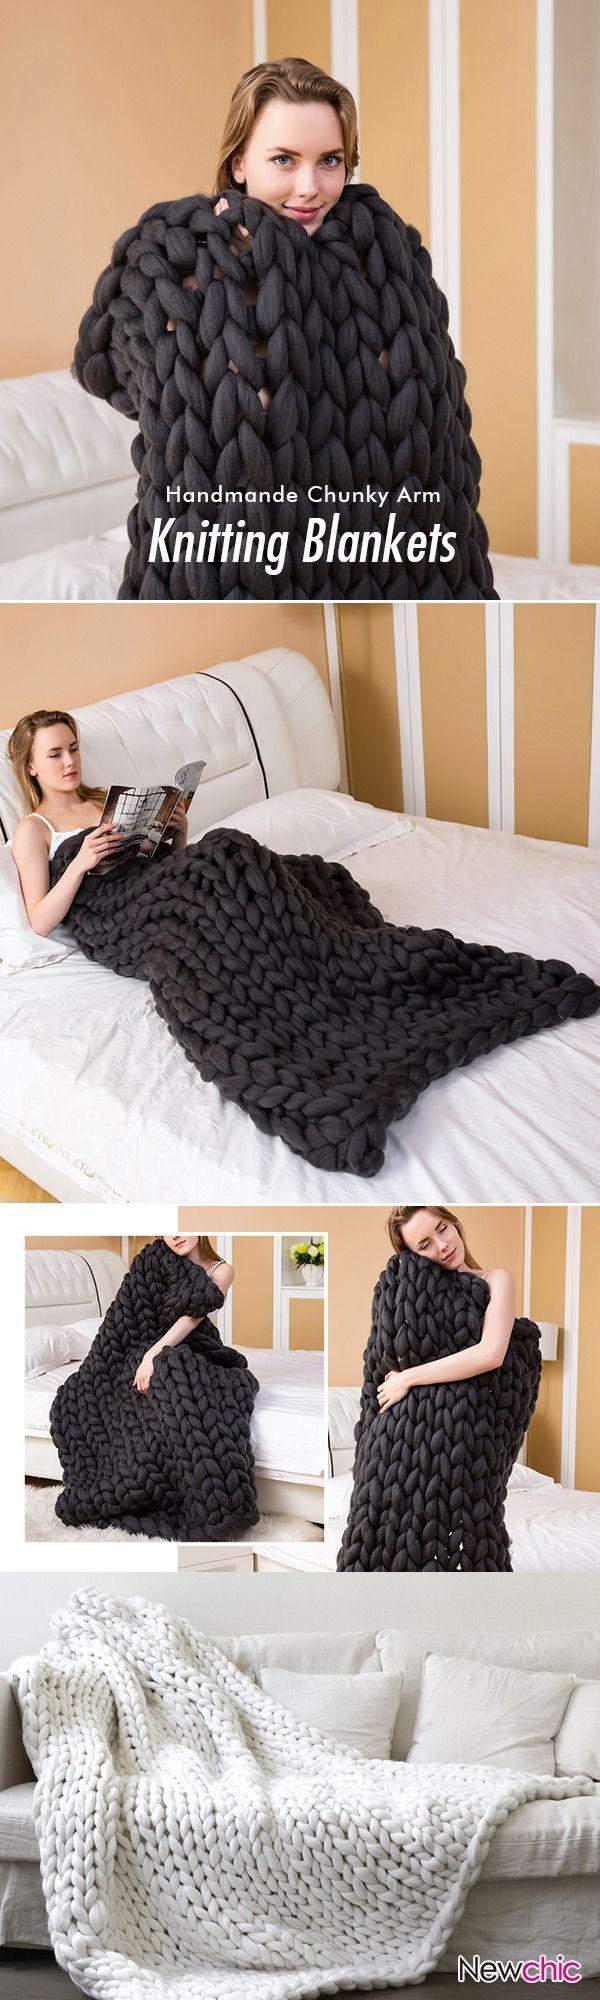 US$17.44  New Handmade Chunky Knit Blanket Thick Yarn Merino Throw Bed Sofa Decor#newchic#bedding#knitting#handmade